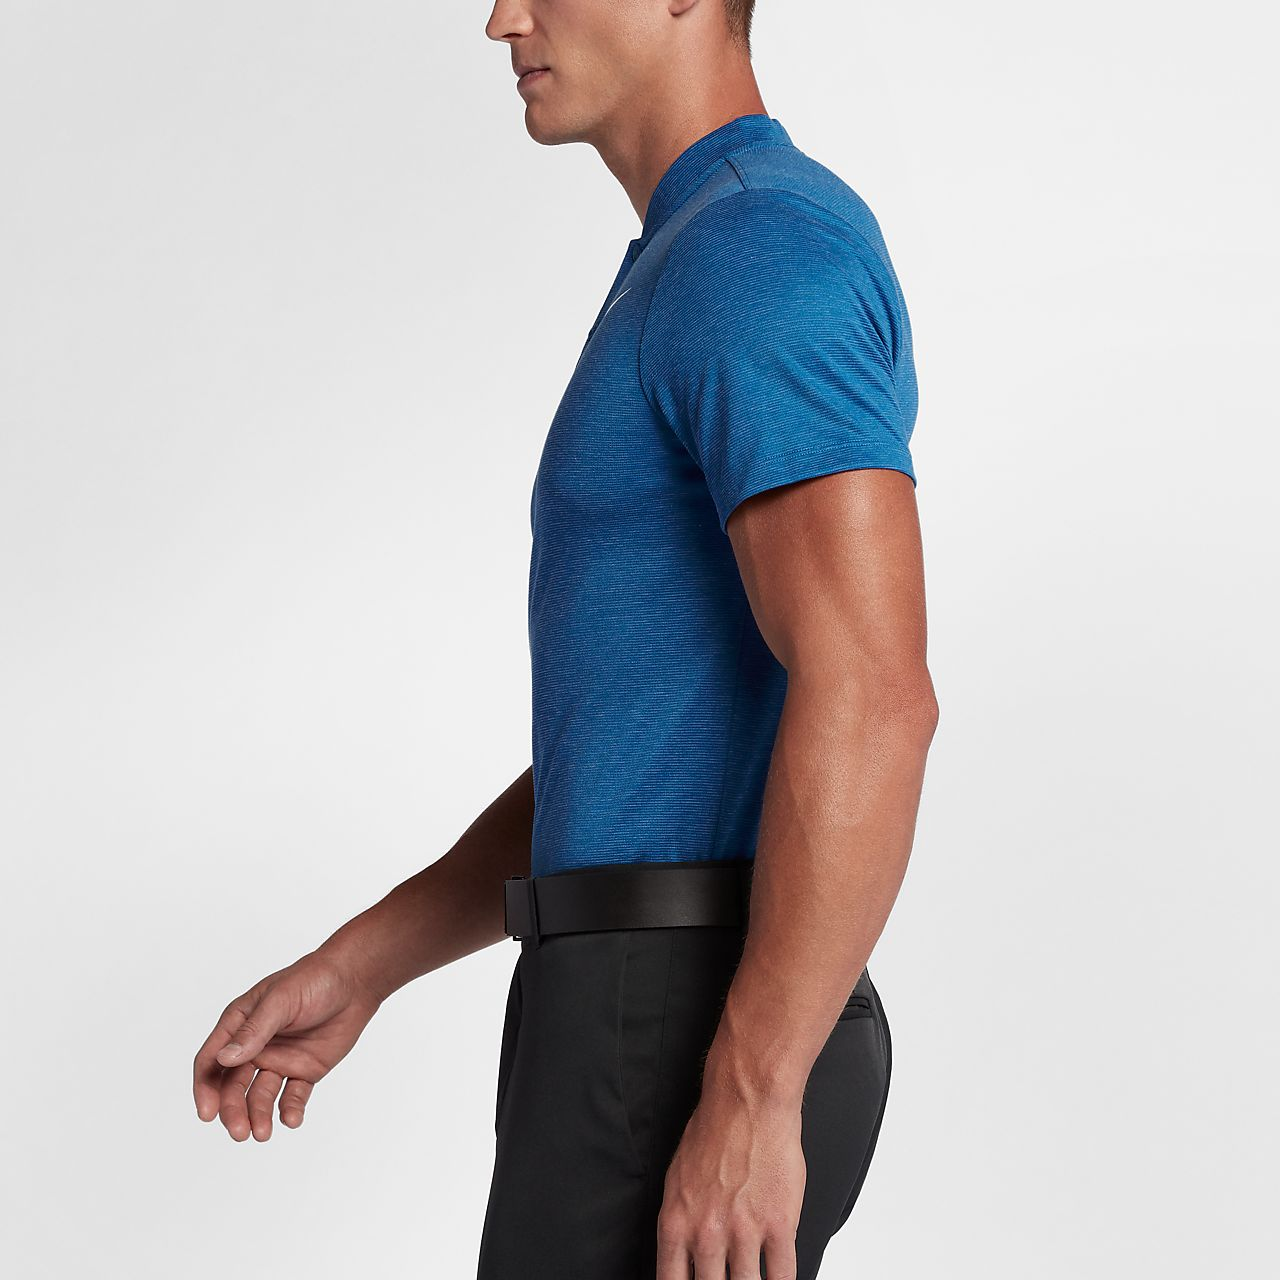 b5533a164 Nike Ultra 2 Men's Slim Fit Golf Polo. Nike.com RO